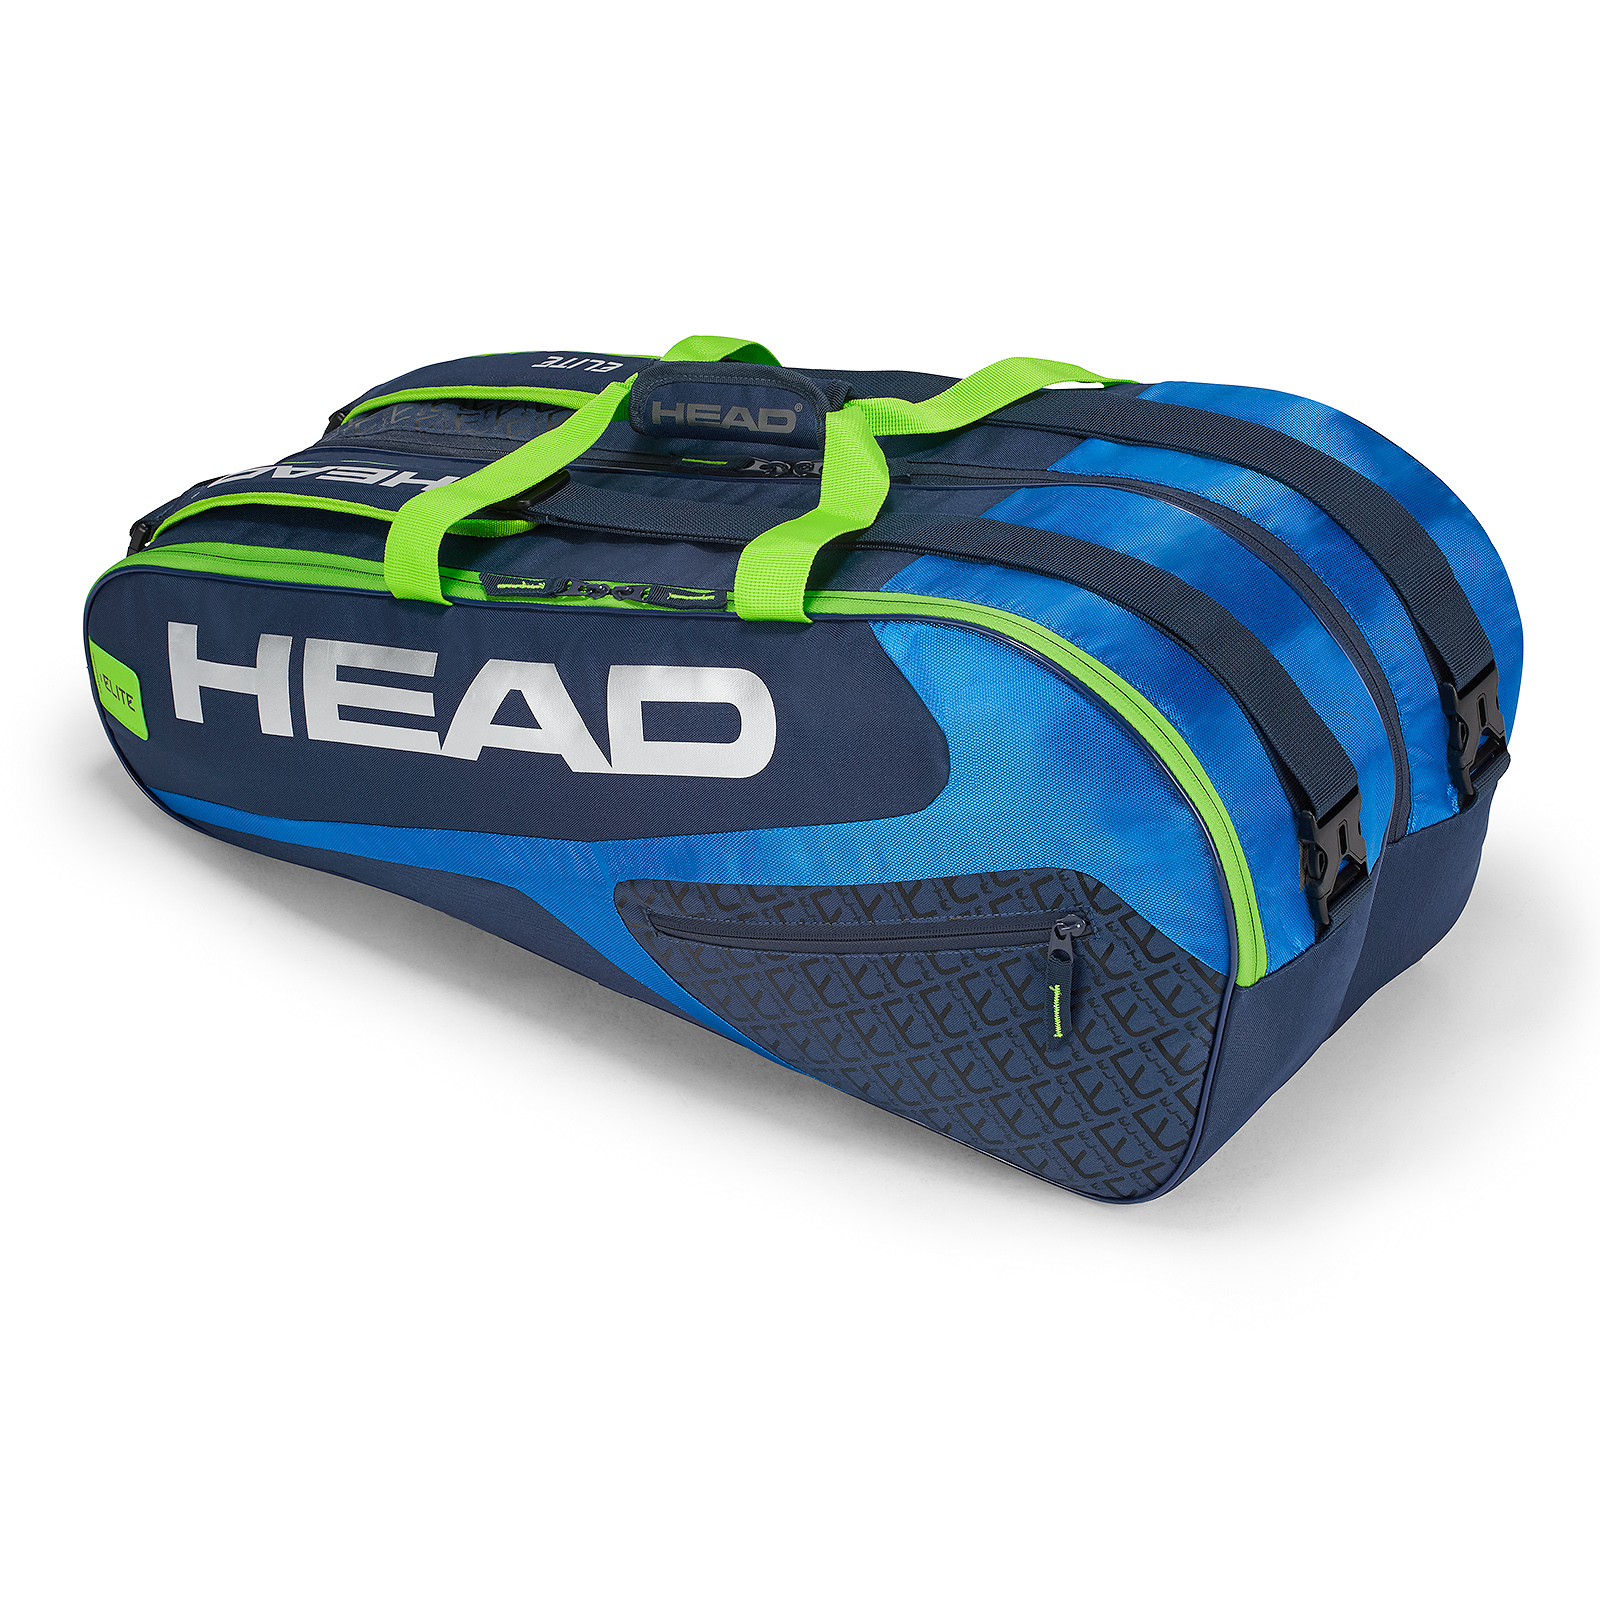 HEAD Elite 9R Supercombi Blue 2018